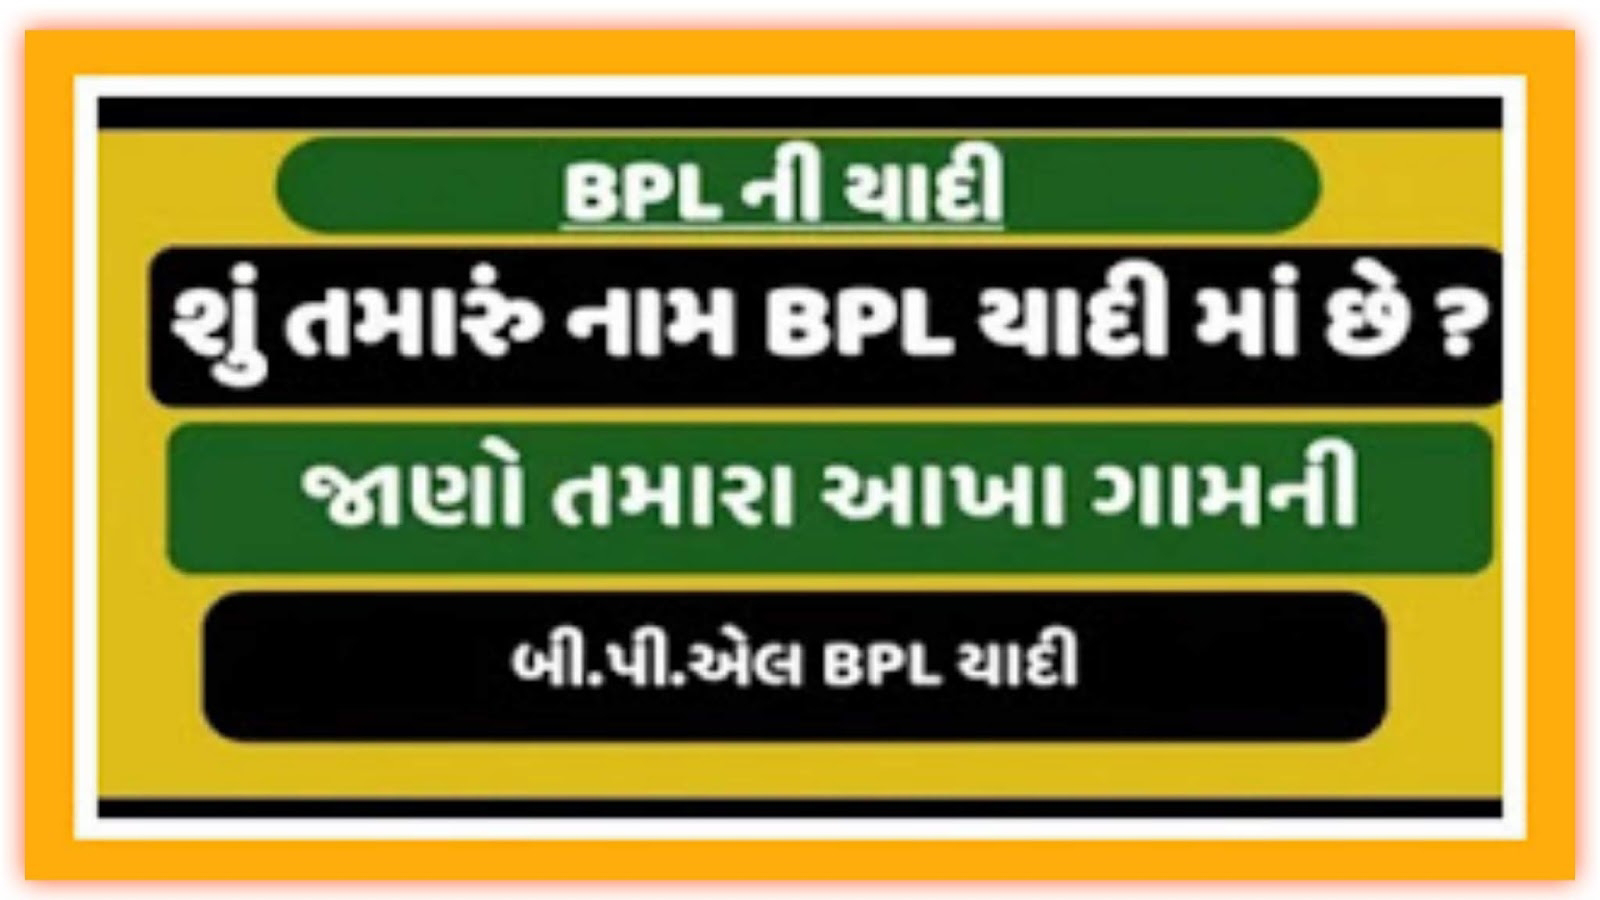 [New BPL] Gujarat BPL Ration Card List | BPL Yadi Gujarat